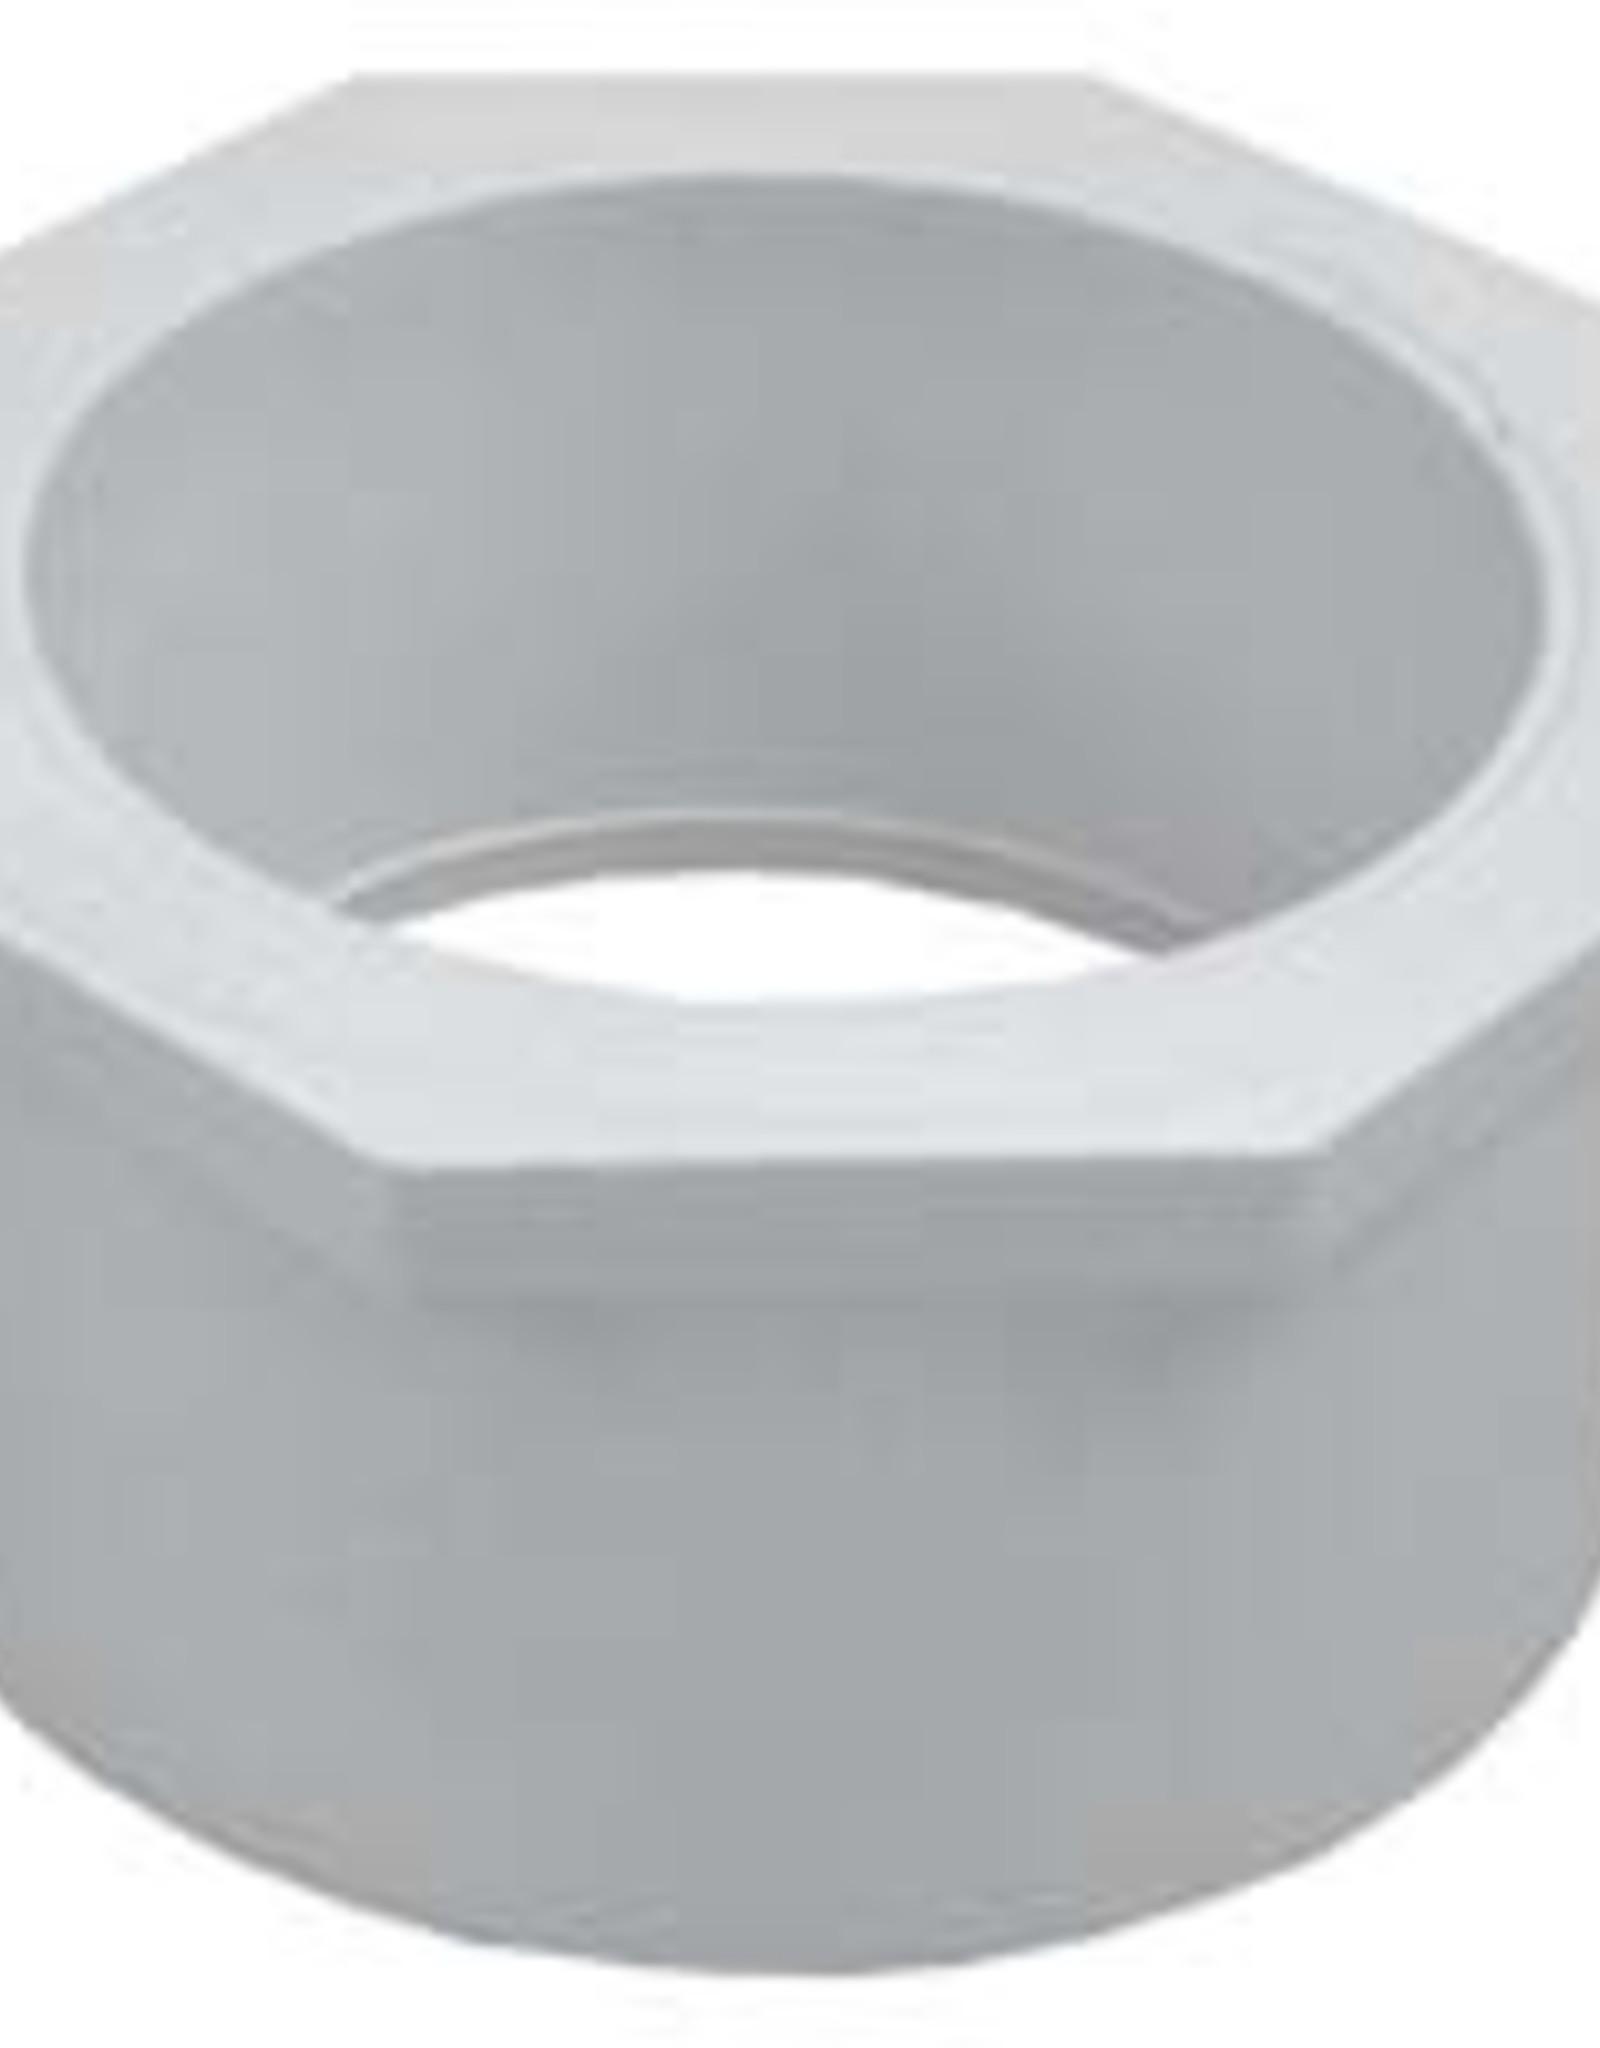 "Dura Plastic Products PVC 2 x 1.5"" Reducing Bushing SC 40"